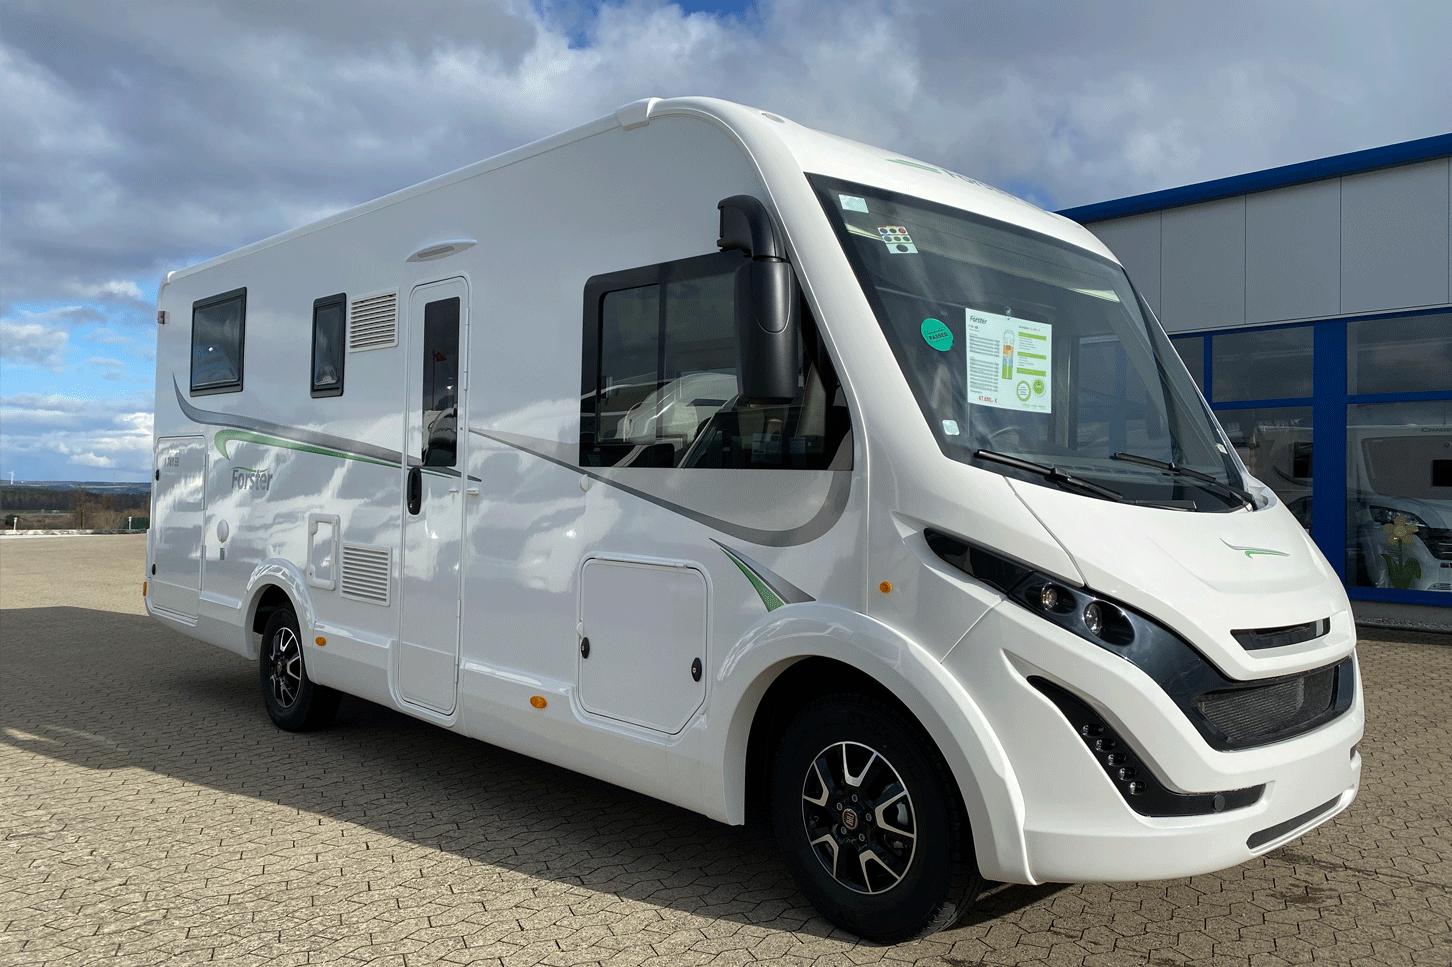 Forster Reisemobile Wohnmobile Aussenfoto